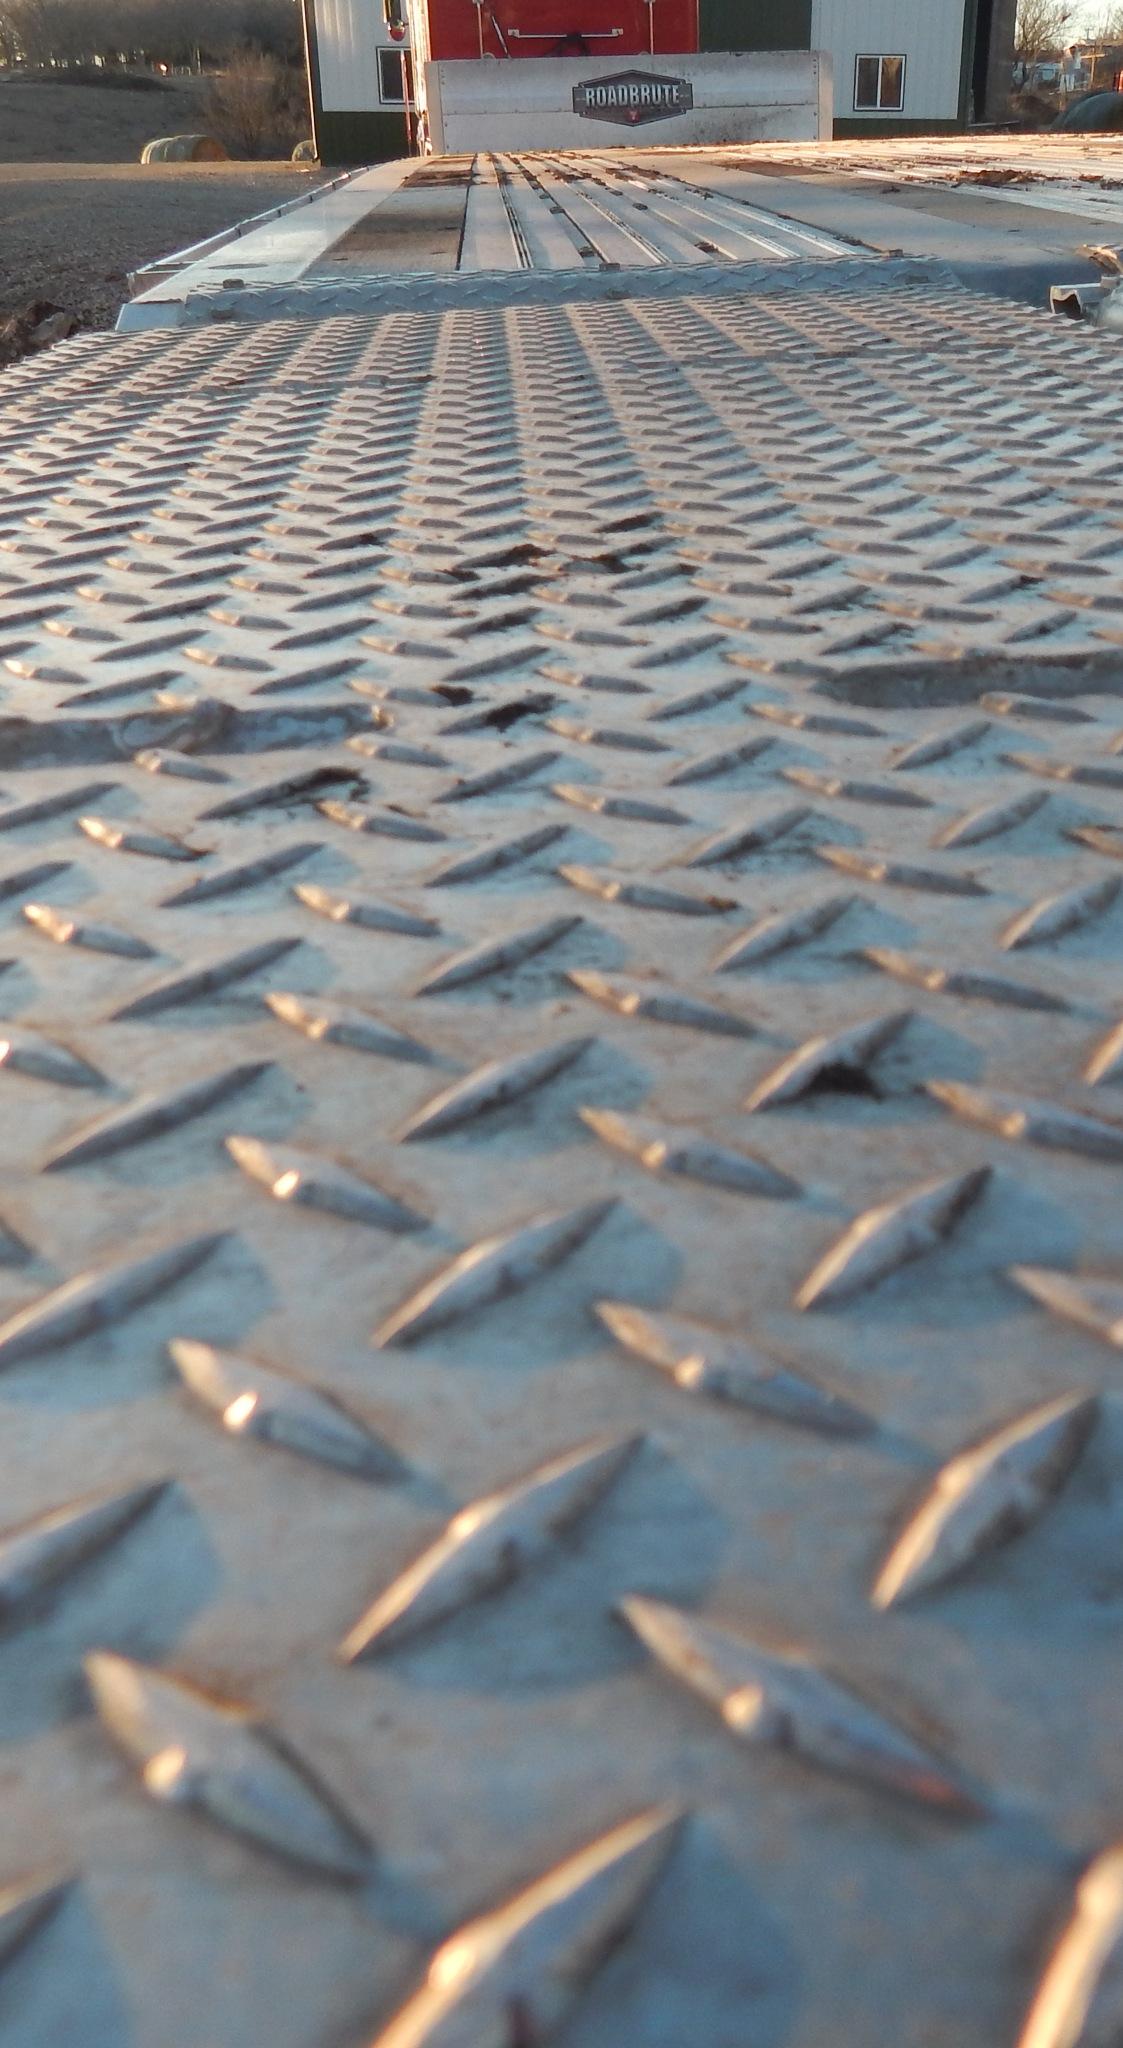 Flat trailor-semi by Marsha Furman